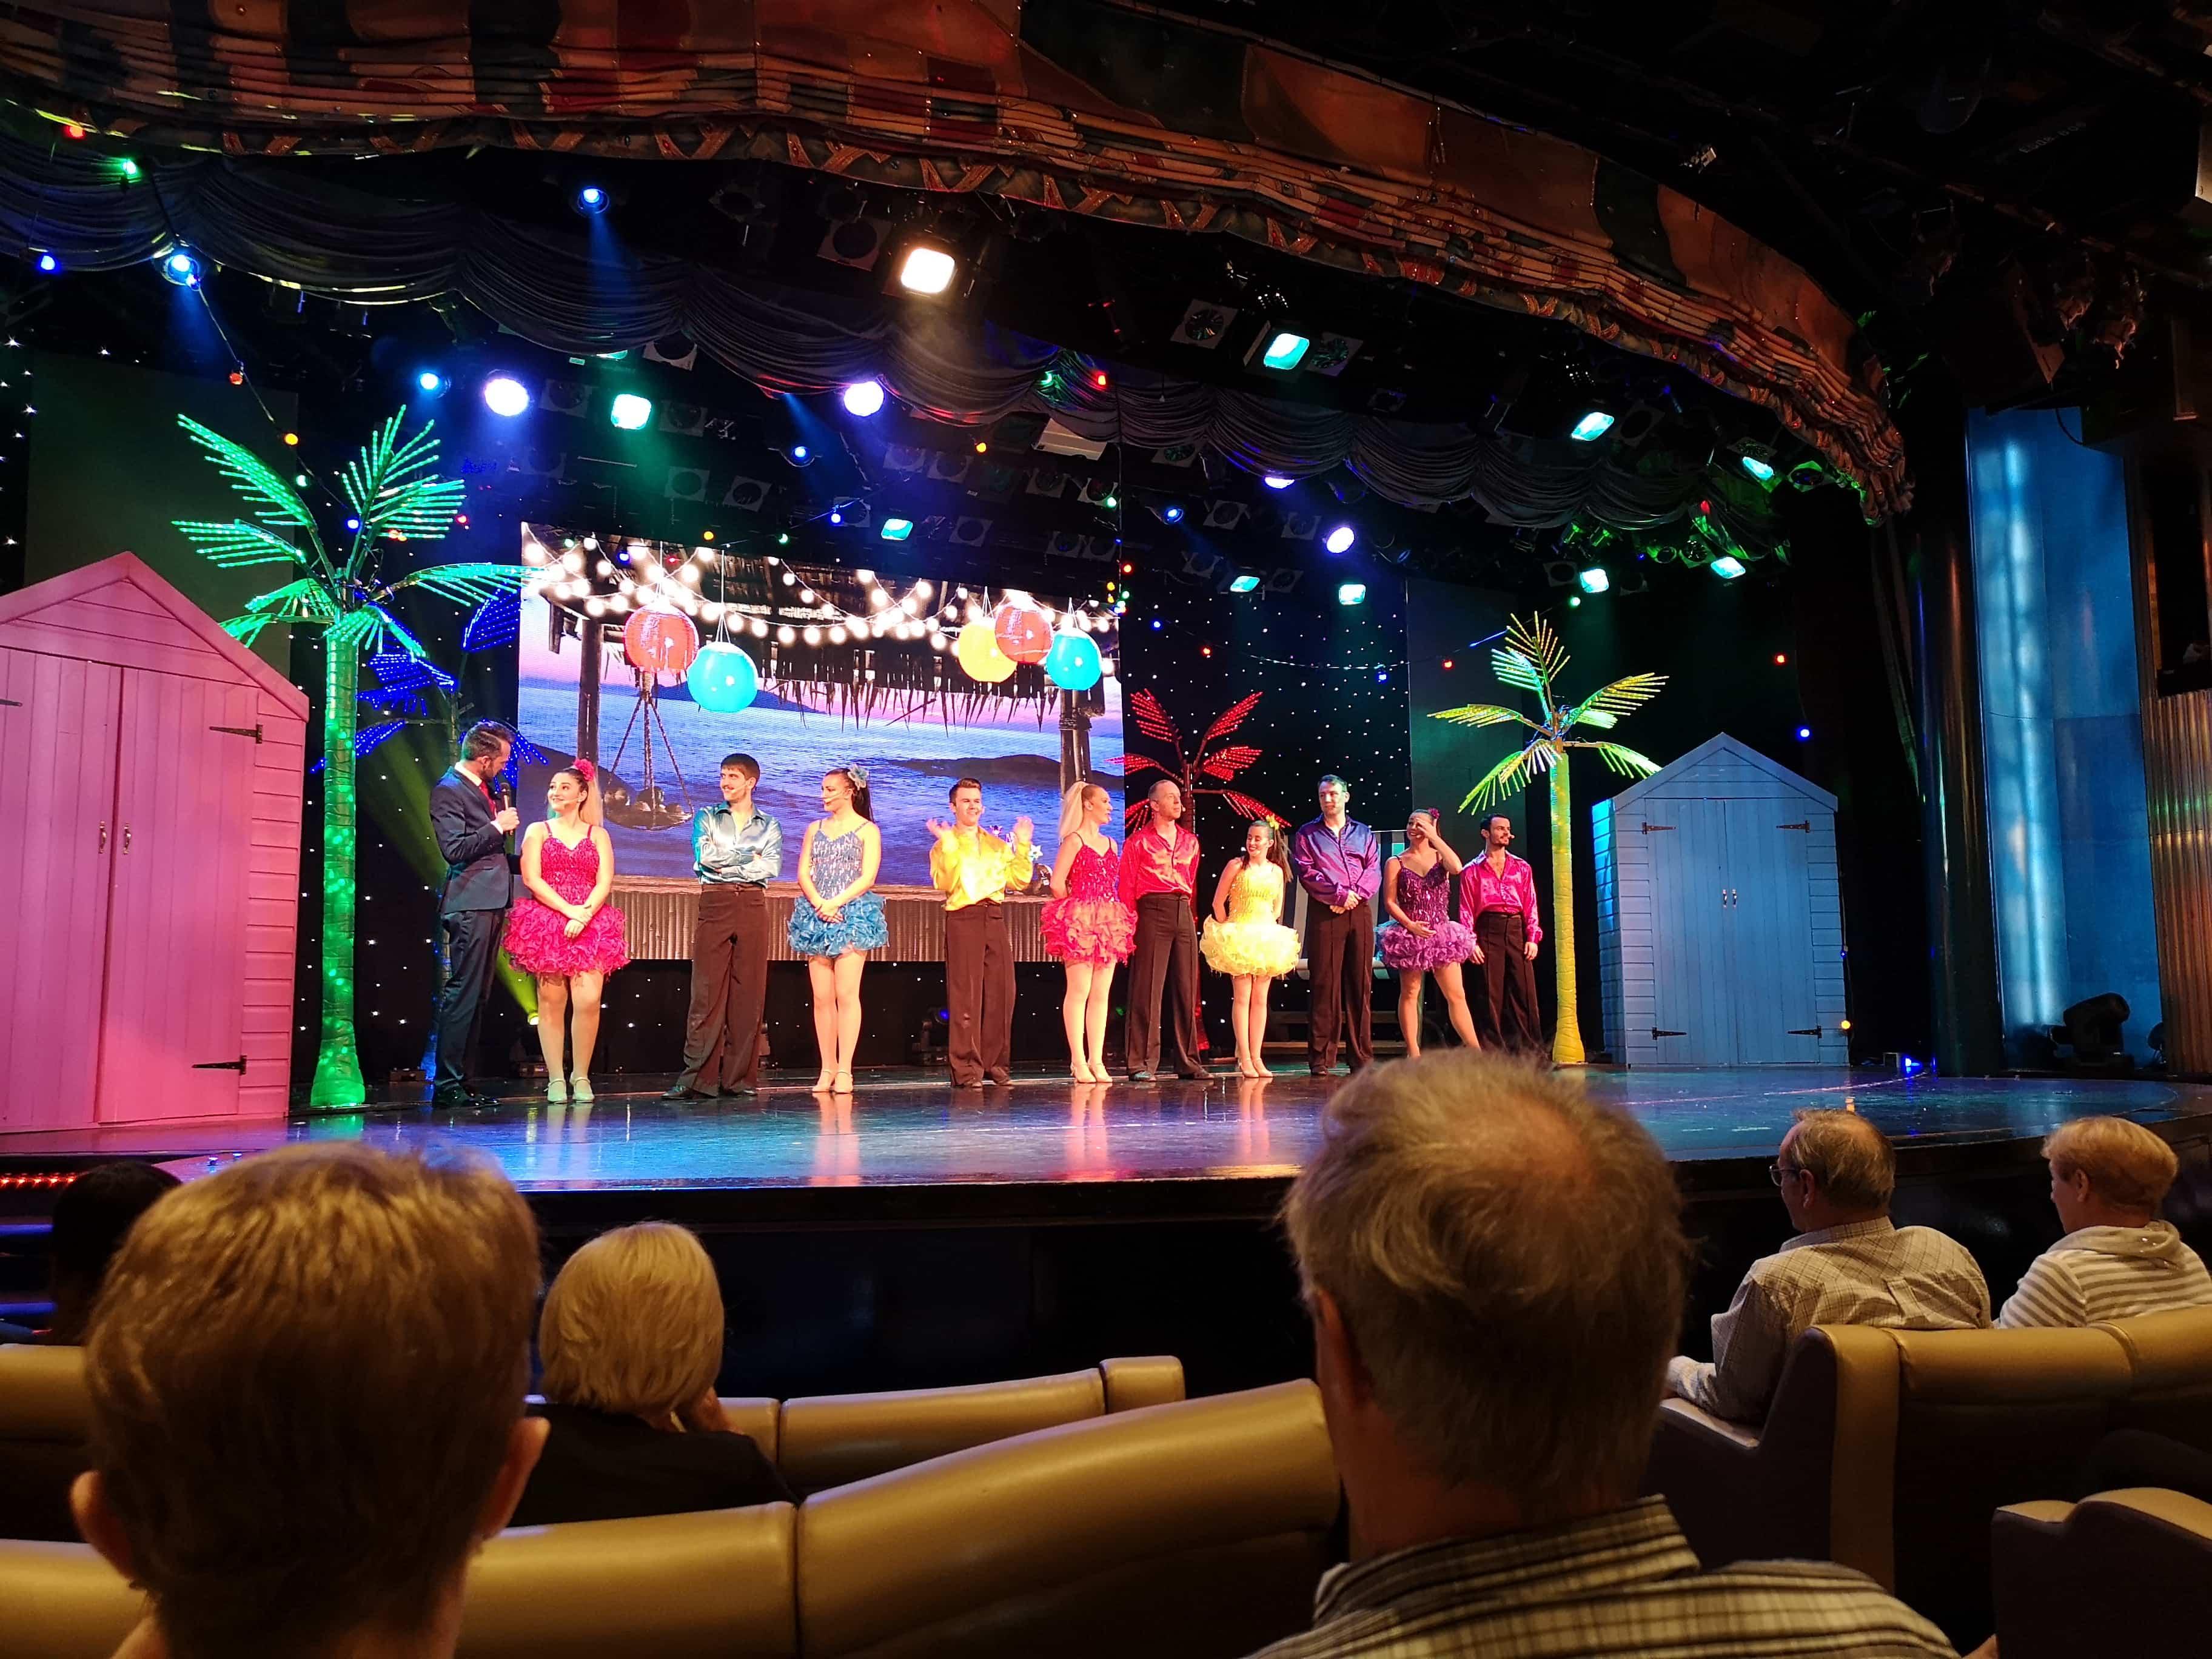 Marella Discovery Entertainment Showteam Sebby Mercury Broadway Show lounge Theatre